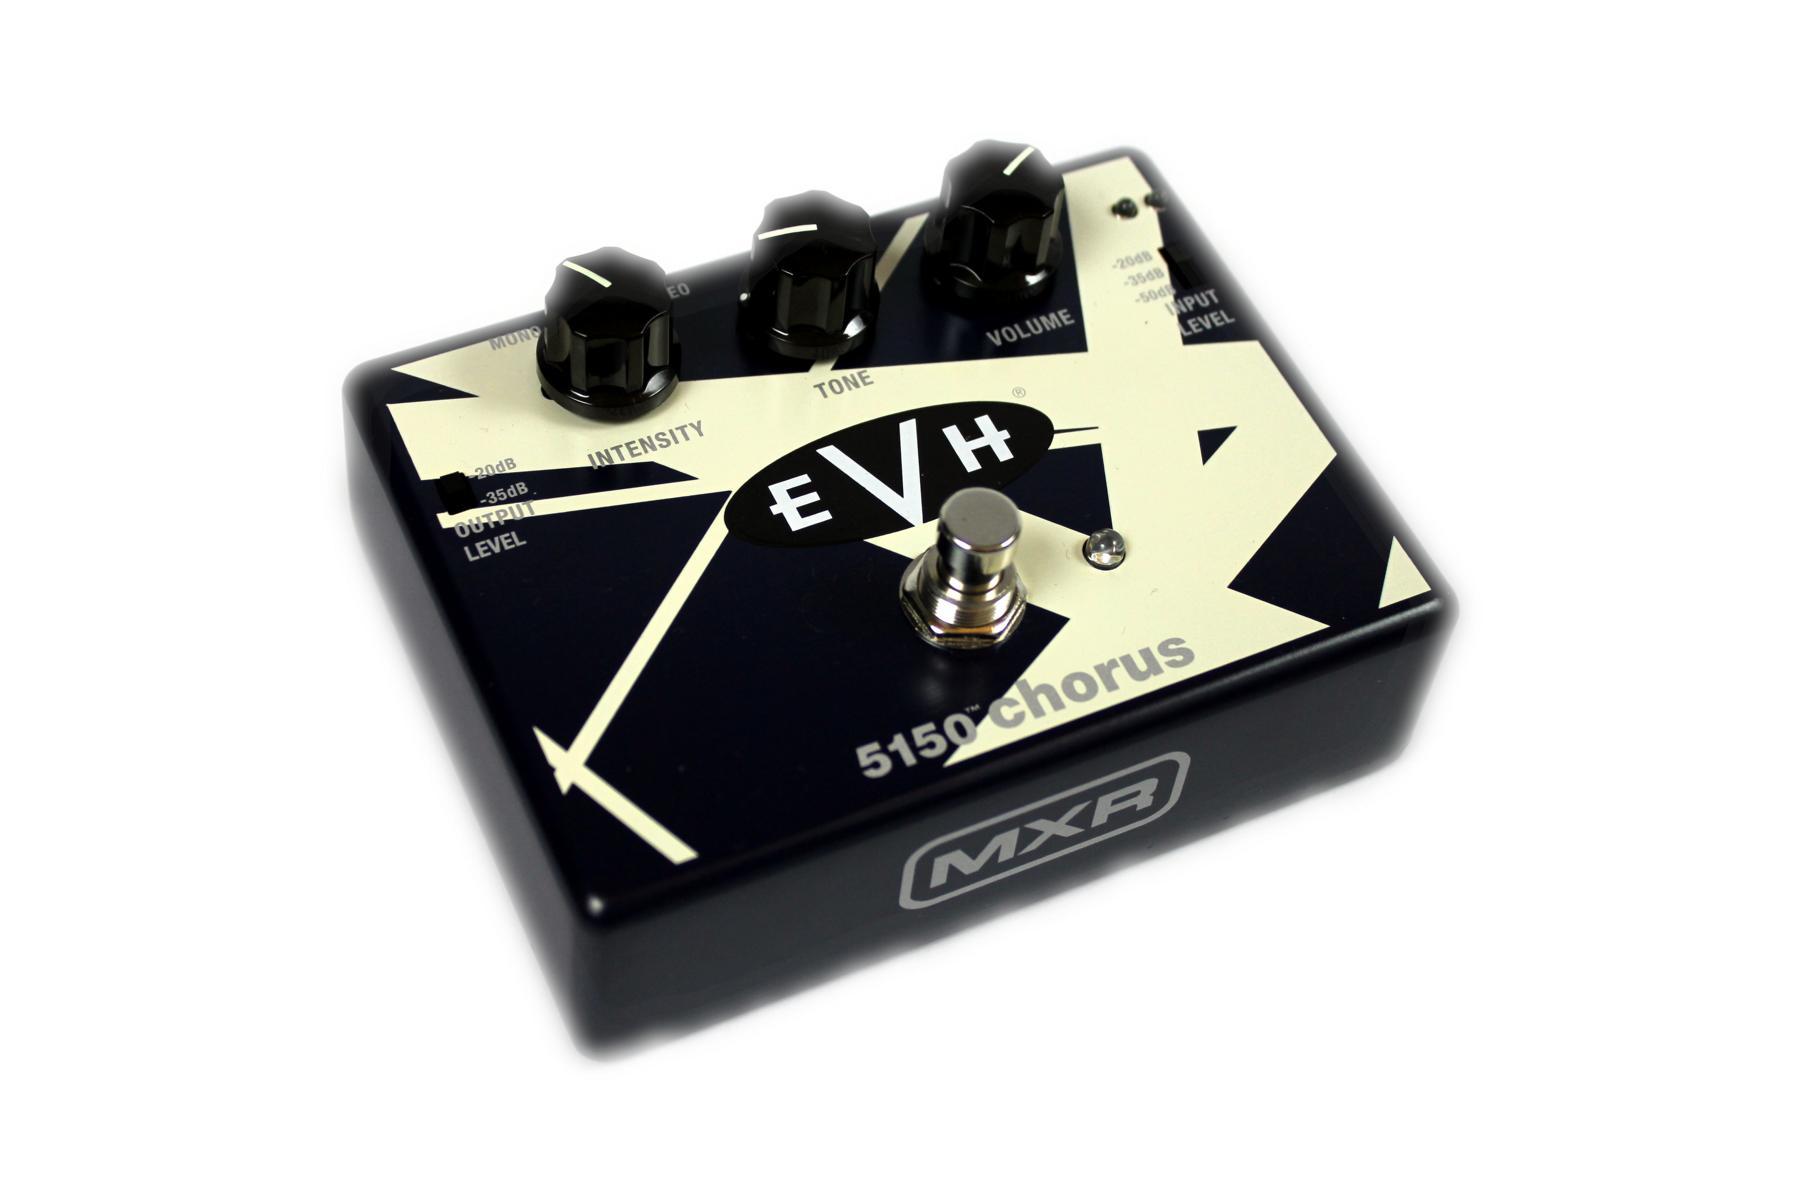 MXR EVH 5150 Chorus